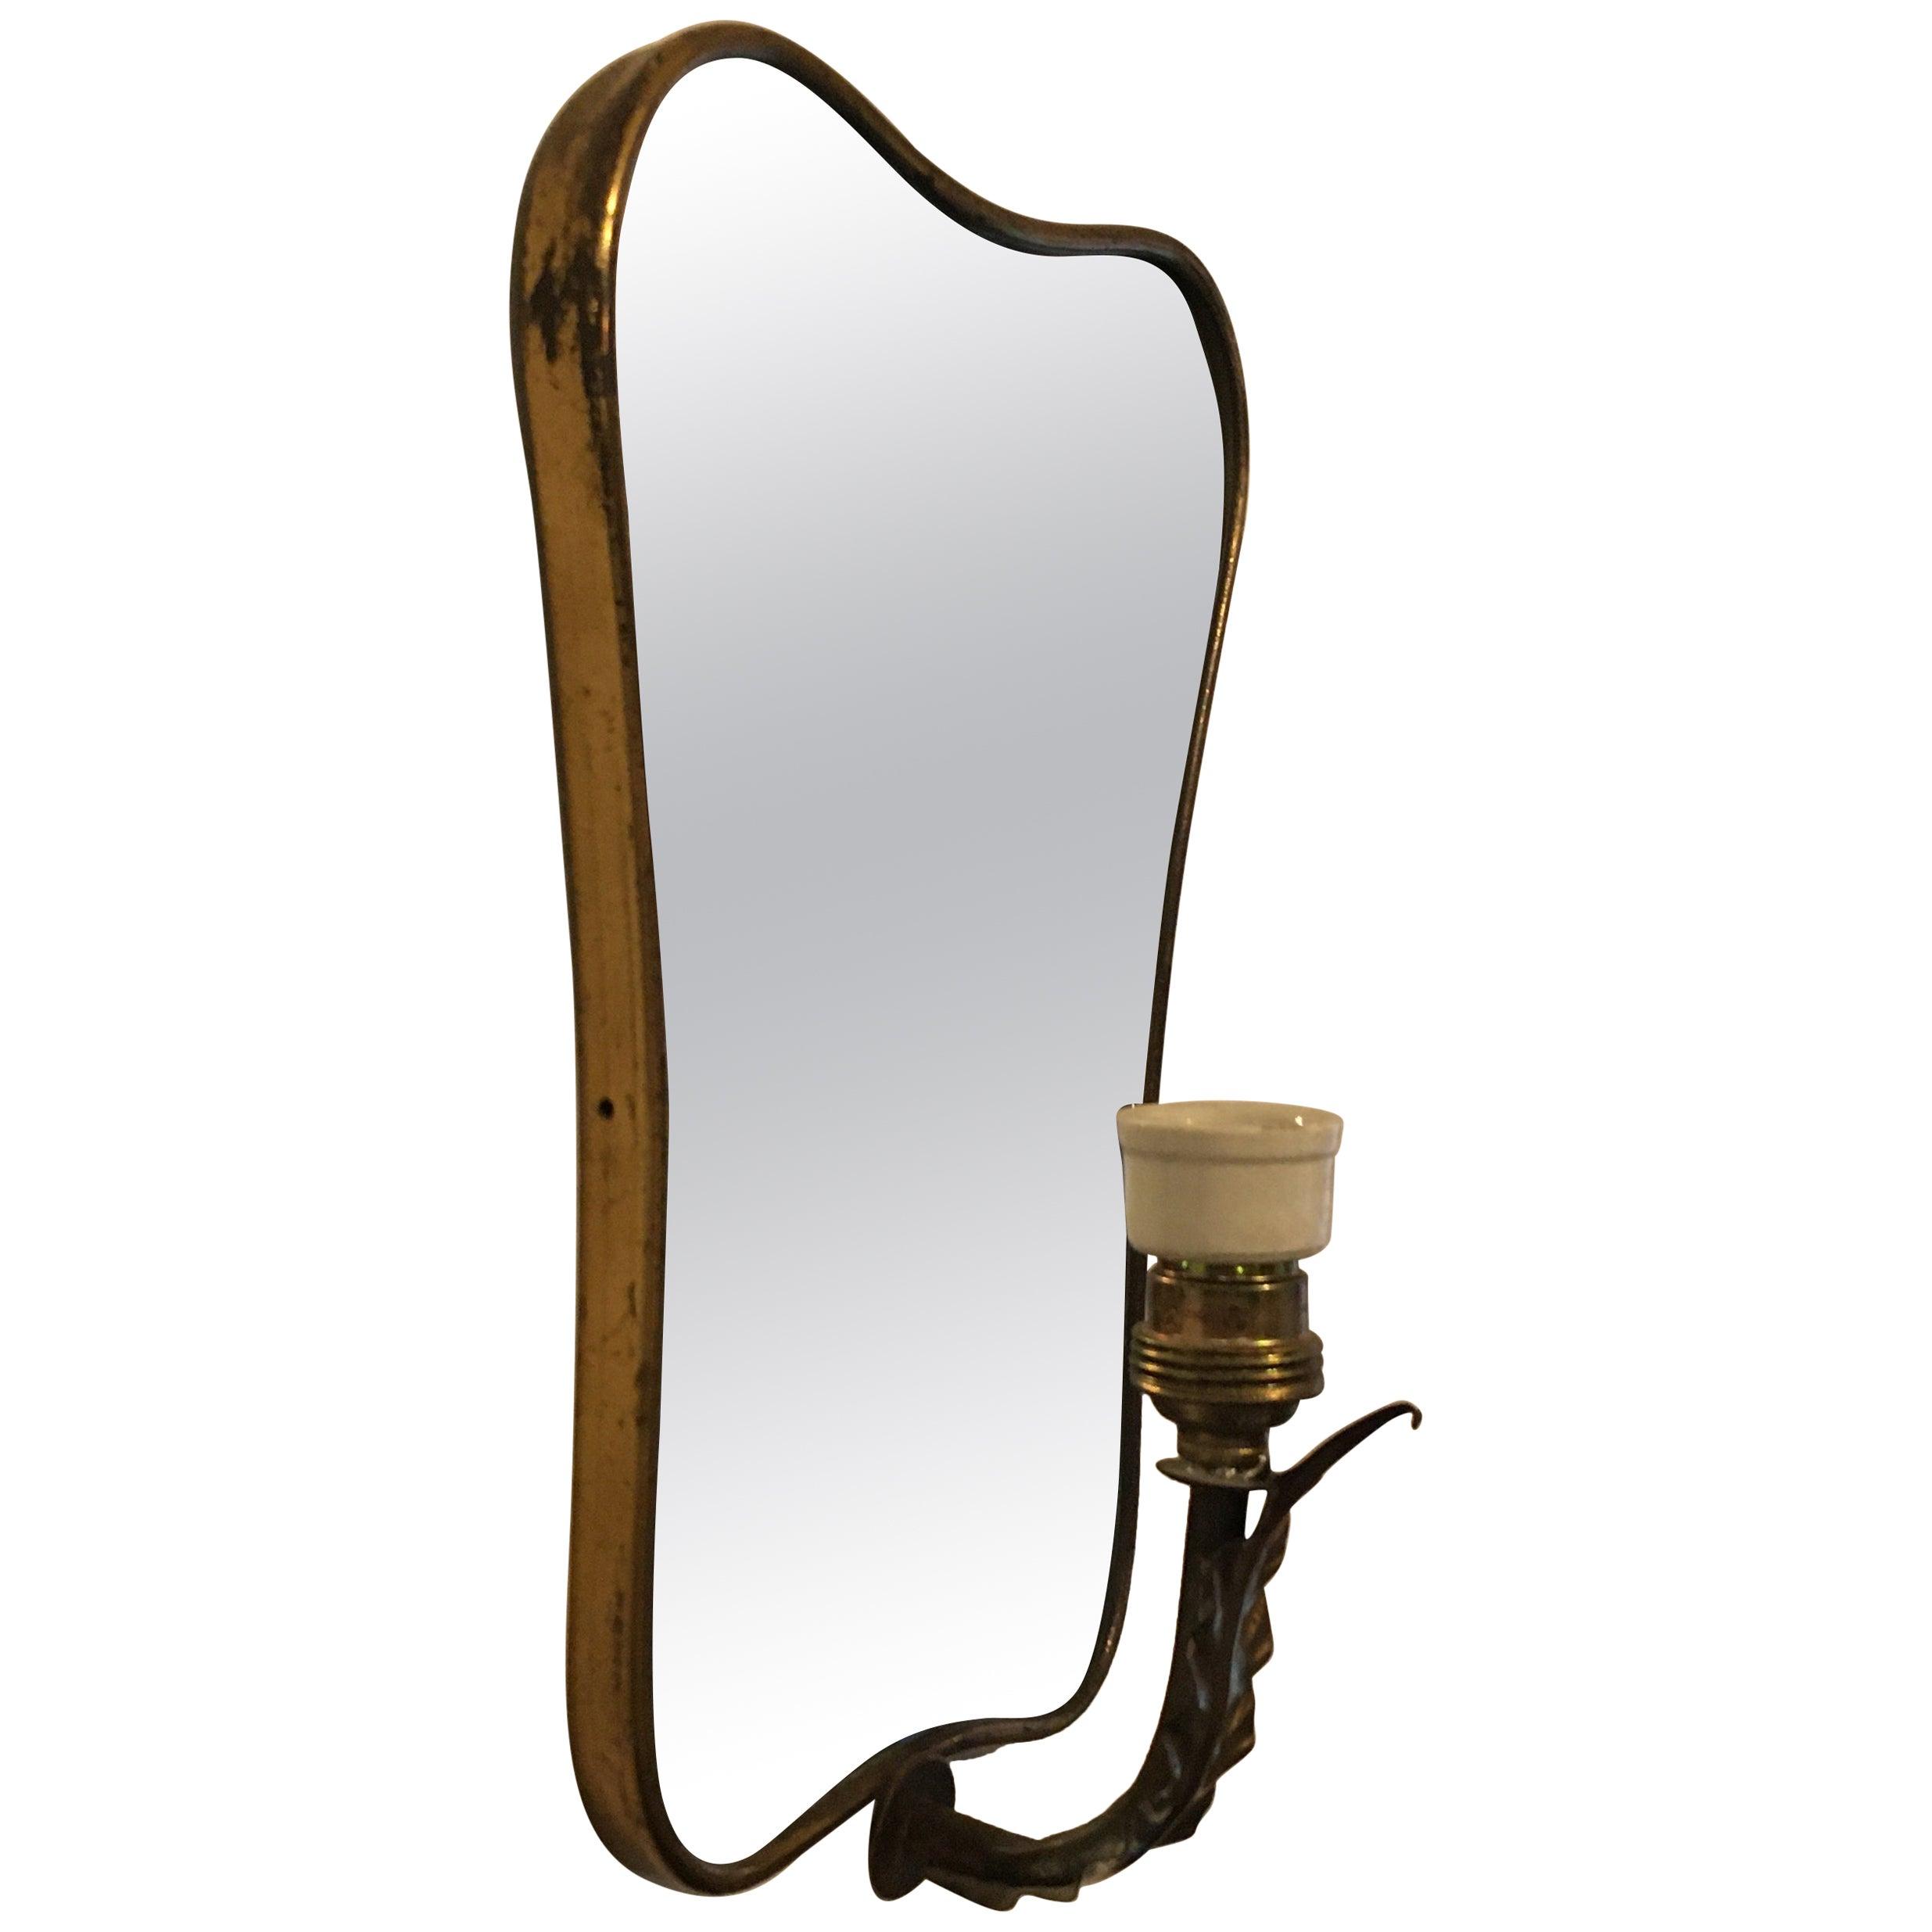 Italian Brass and Ceramic Wall Mirror, 1950s